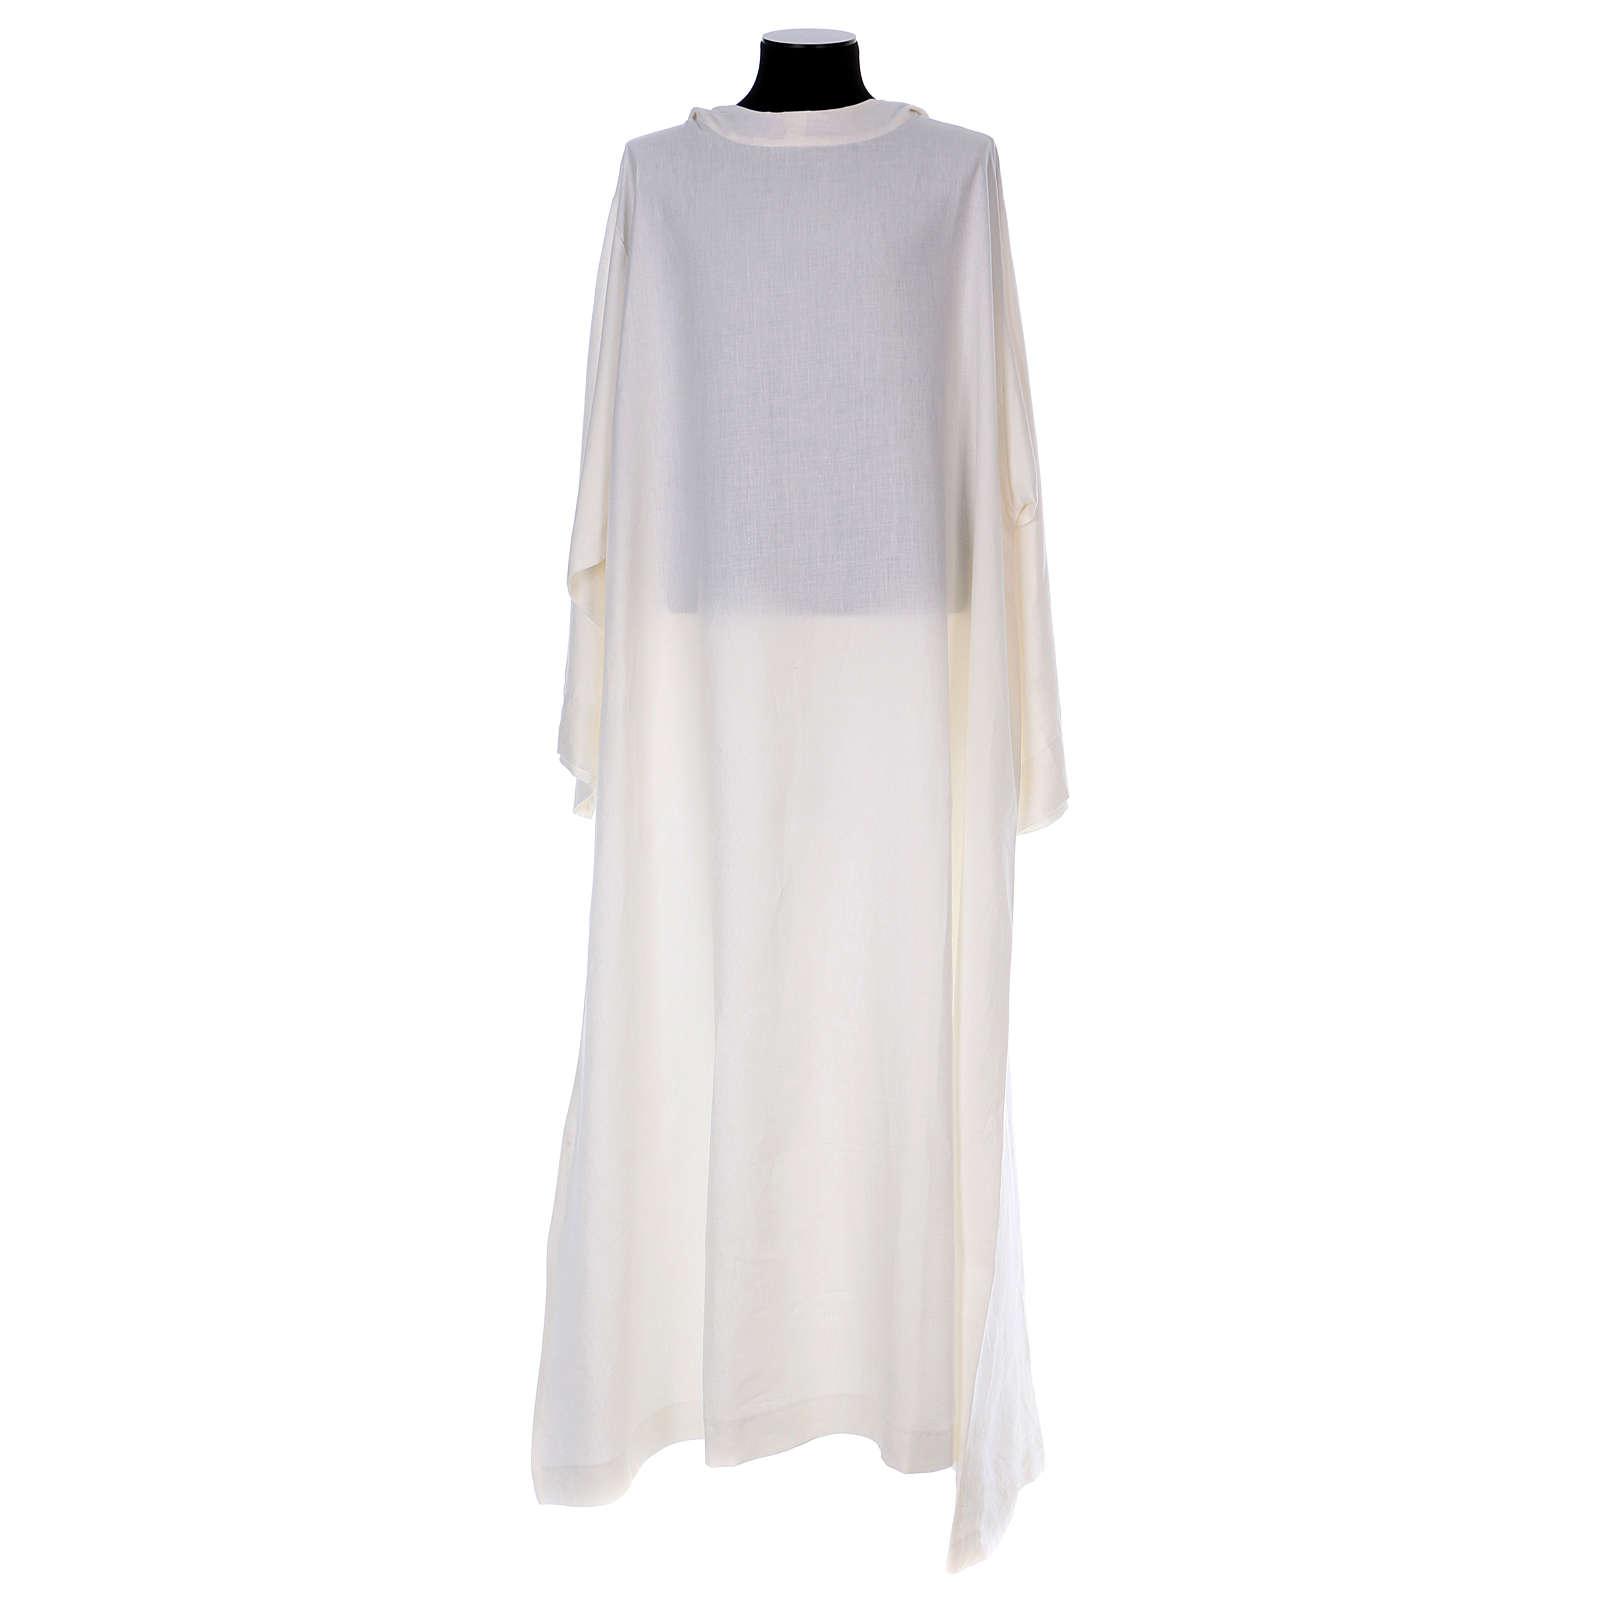 Alba monástica de hilo 4